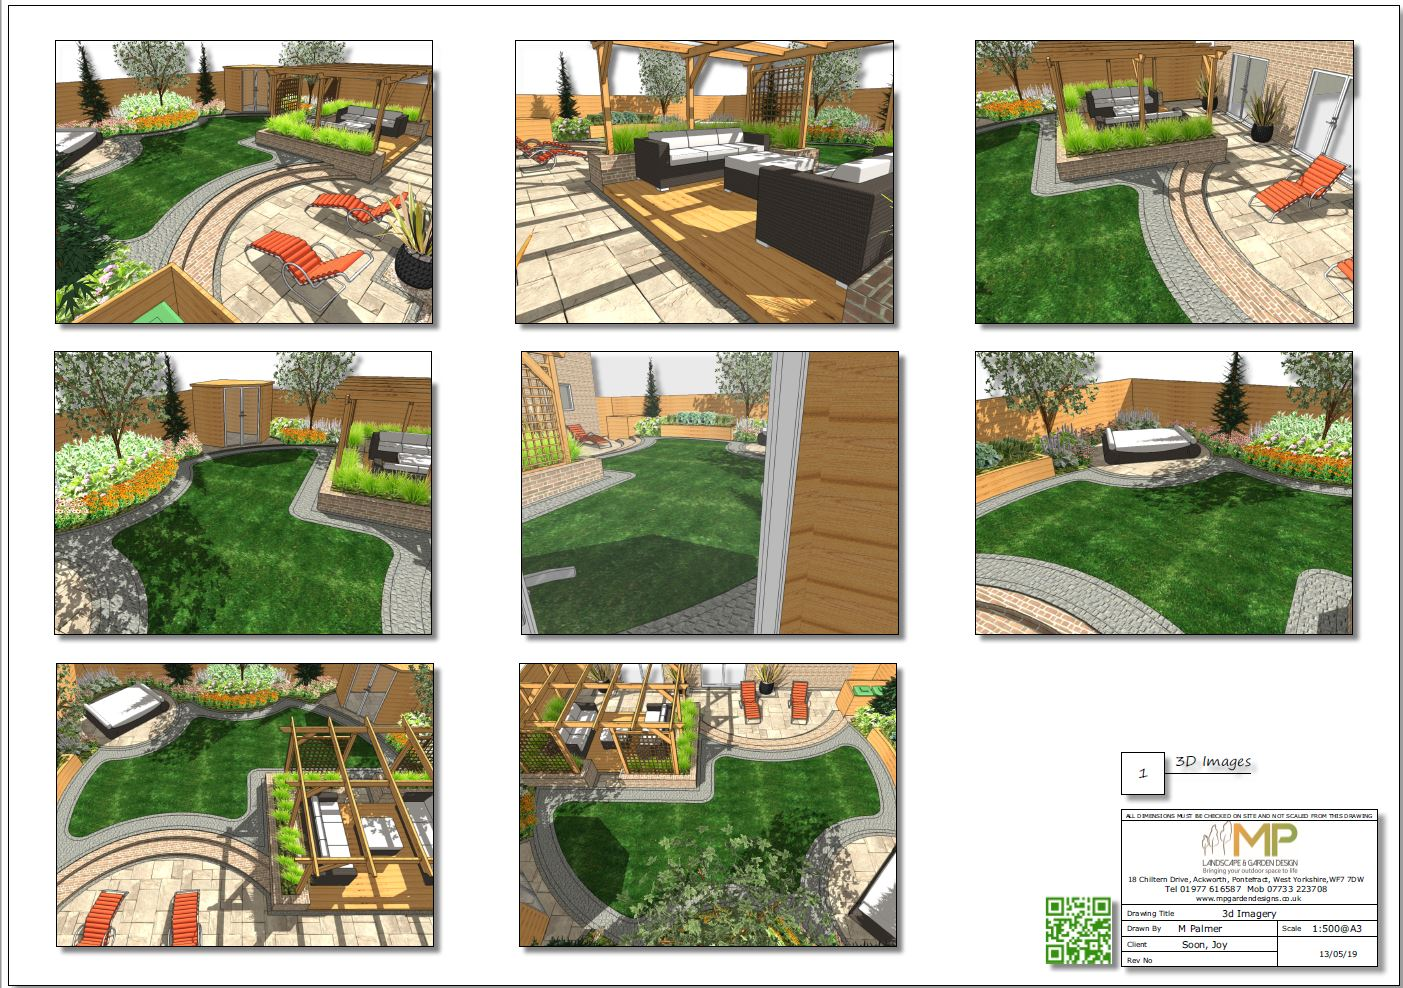 3. Garden design 3D plan for a rear garden in Wakefield.